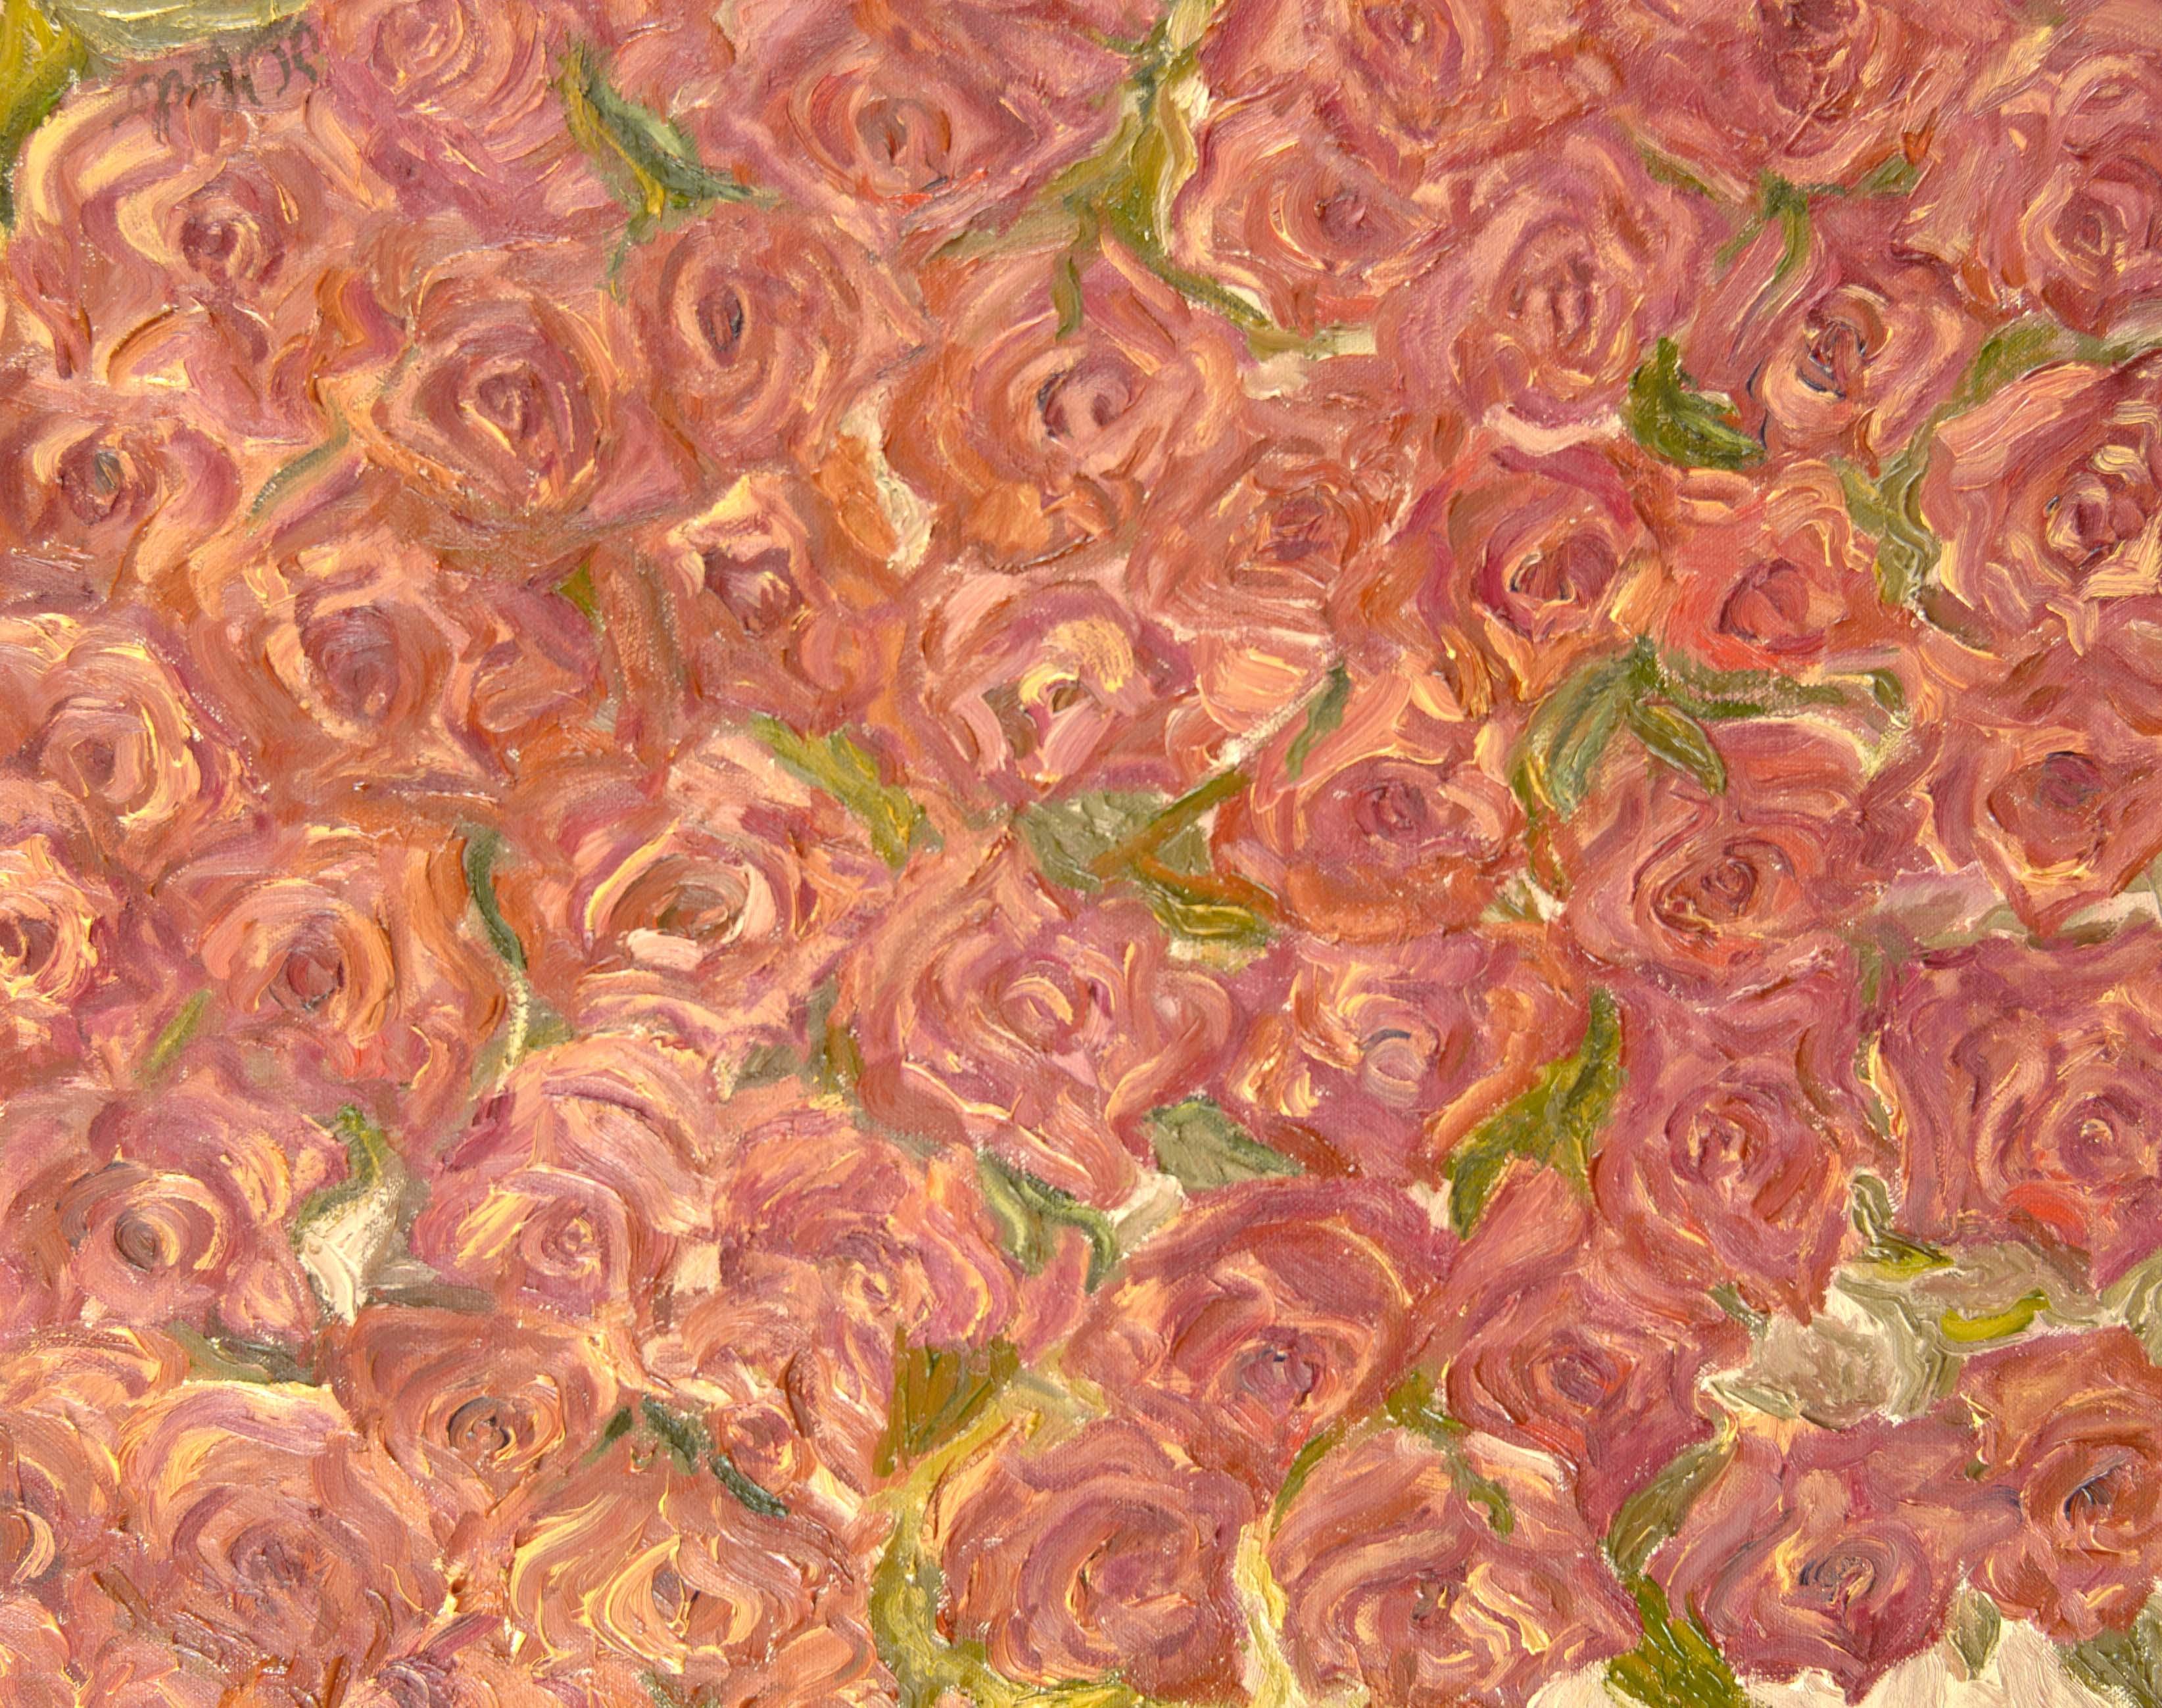 Symphony of Roses